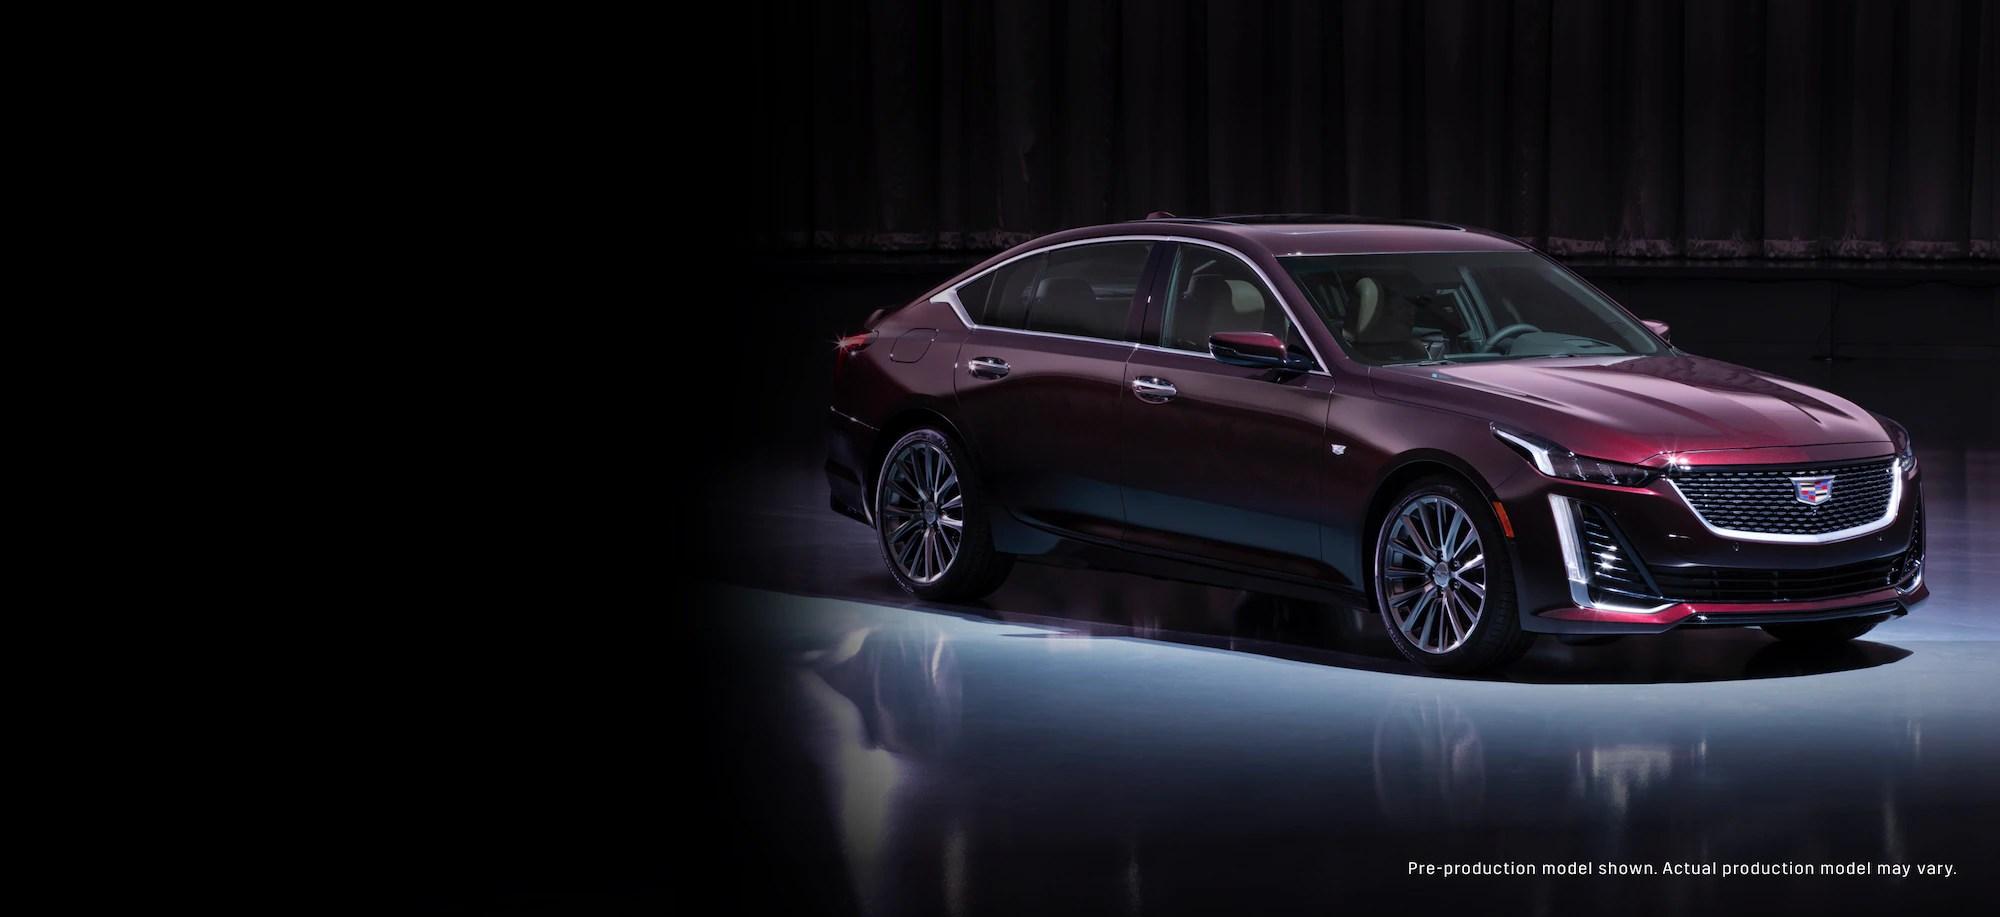 2019 cadillac ct6 sedan front driver side view in satin steel metallic [ 2048 x 939 Pixel ]